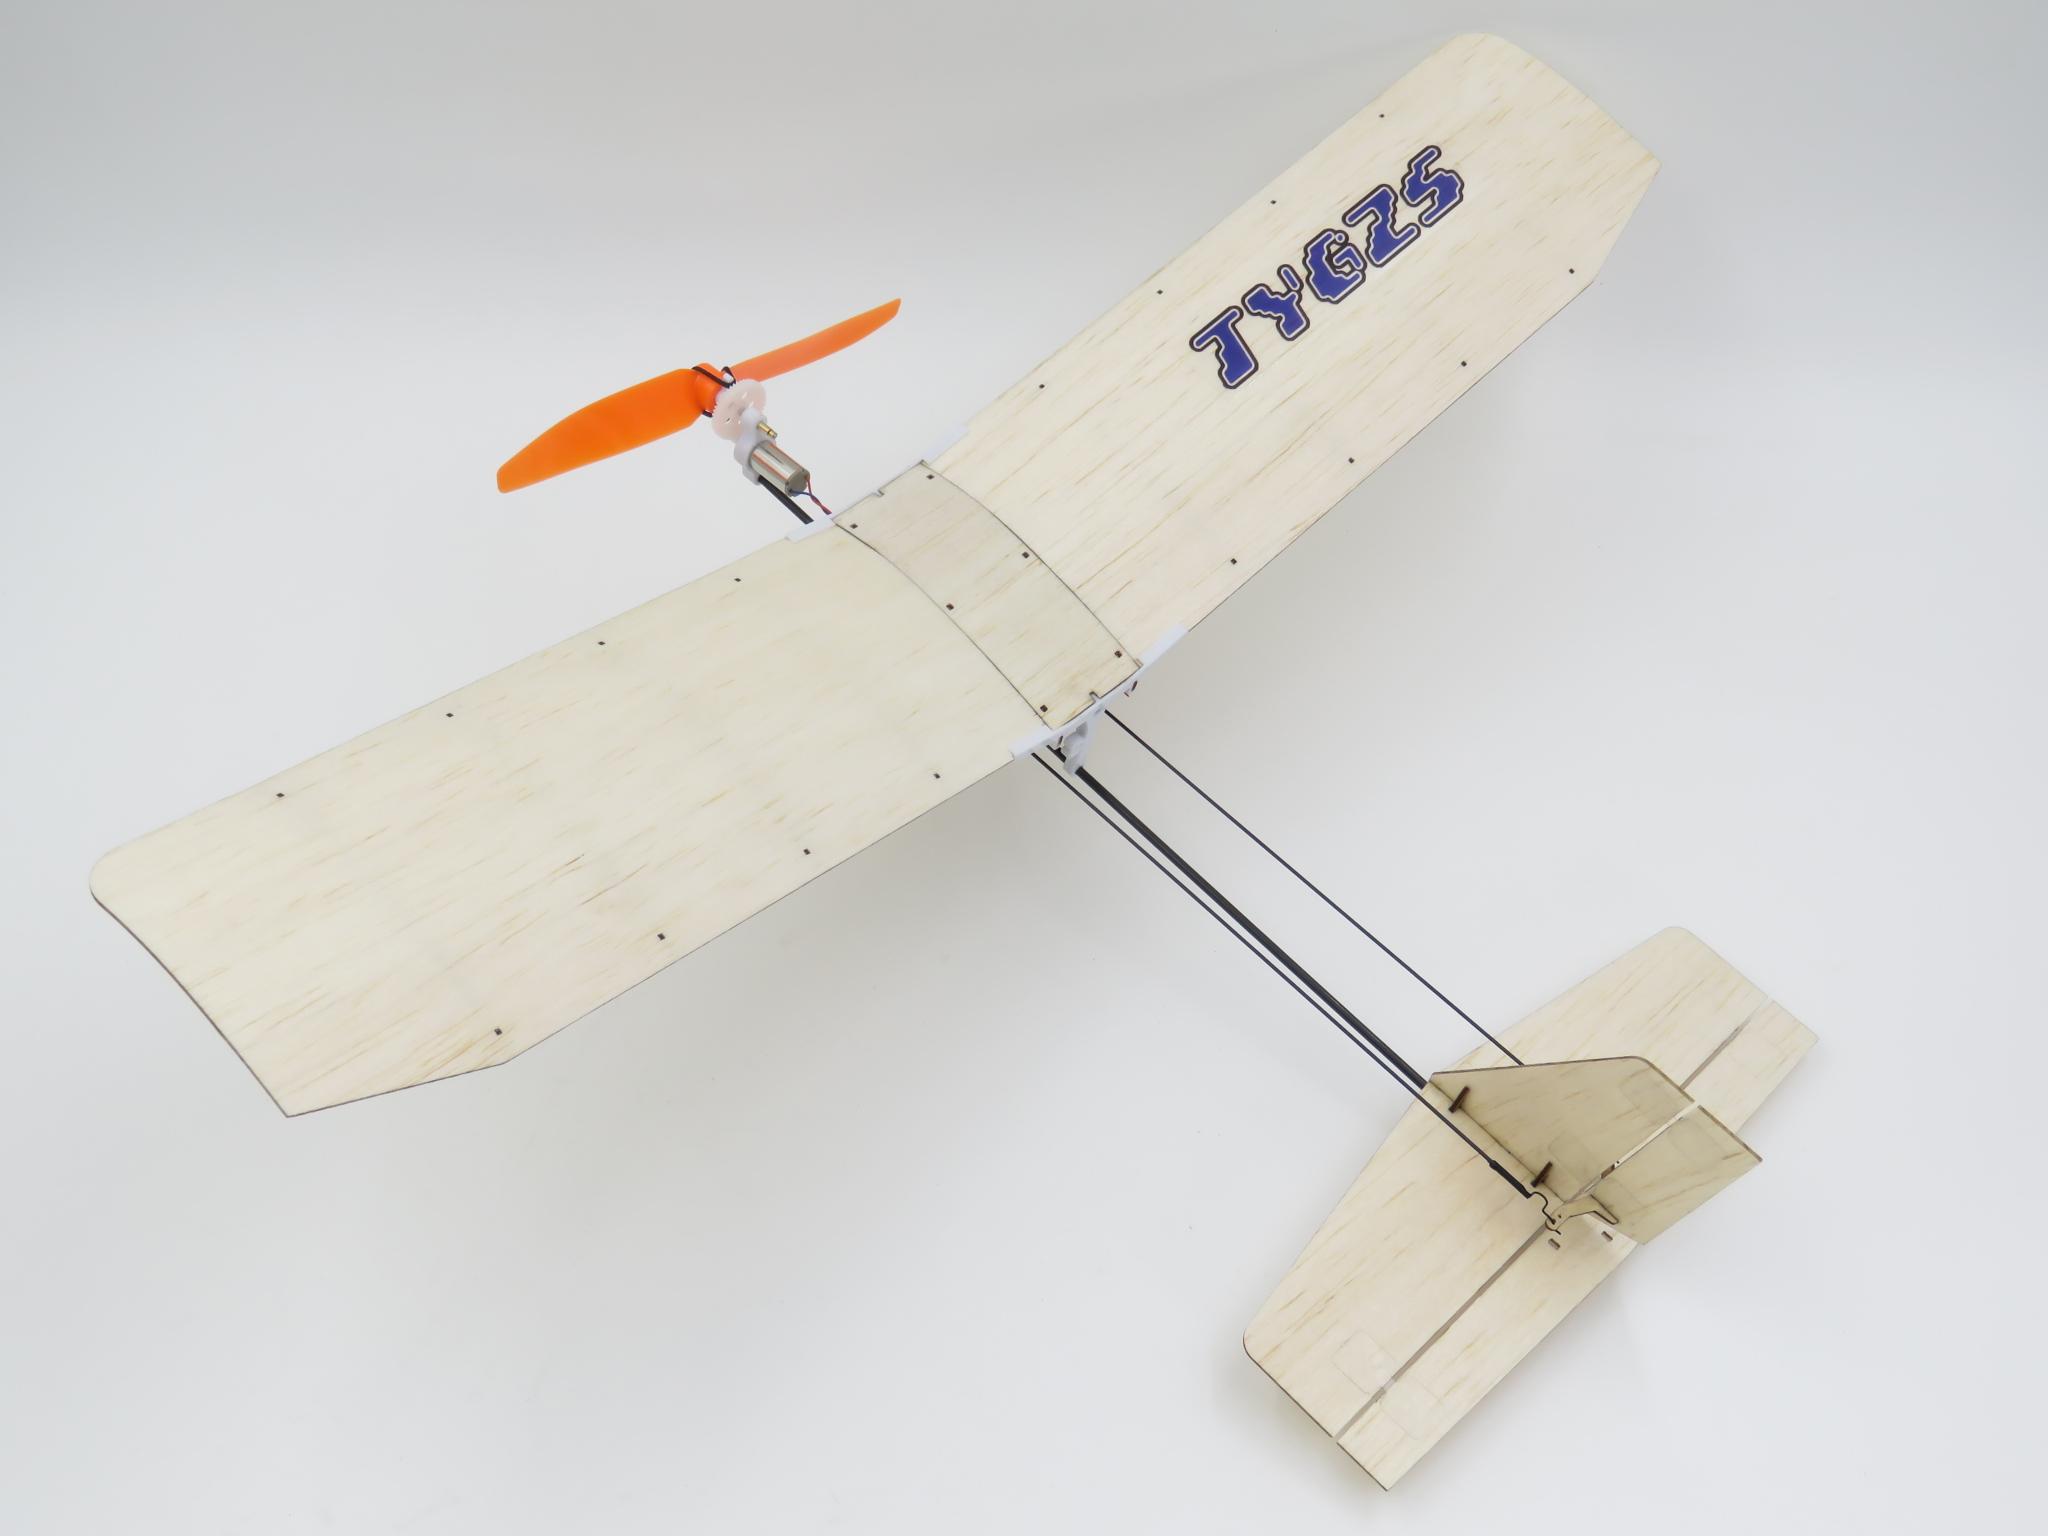 TY Model 3-3 370mm Wingspan Balsa Wood Laser Cut RC Airplane KIT - Photo: 2